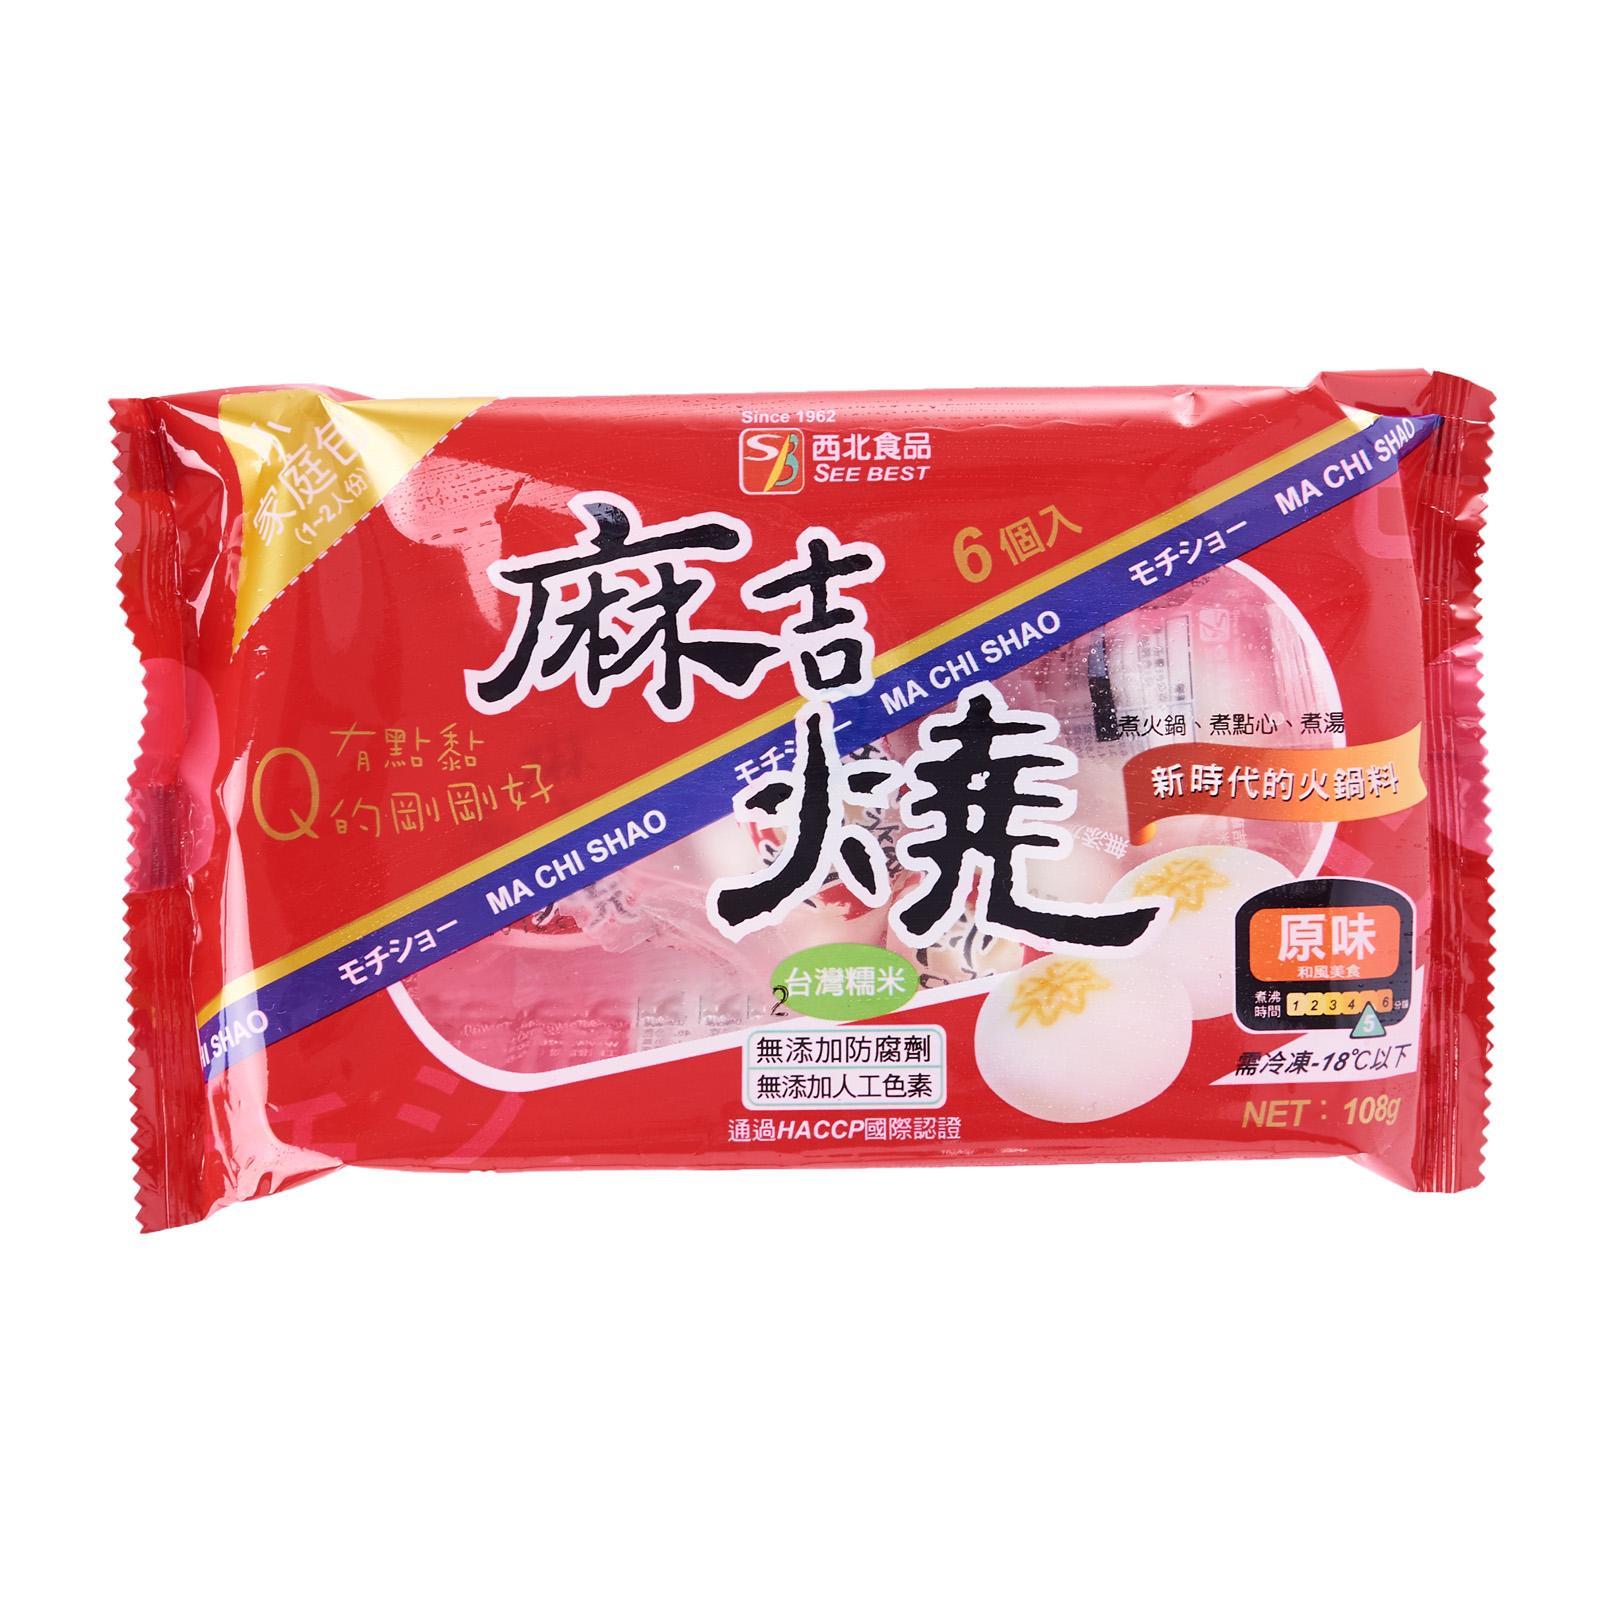 seebest Si Bei Ma Chi Shao Original Flavour Dumplings - Frozen